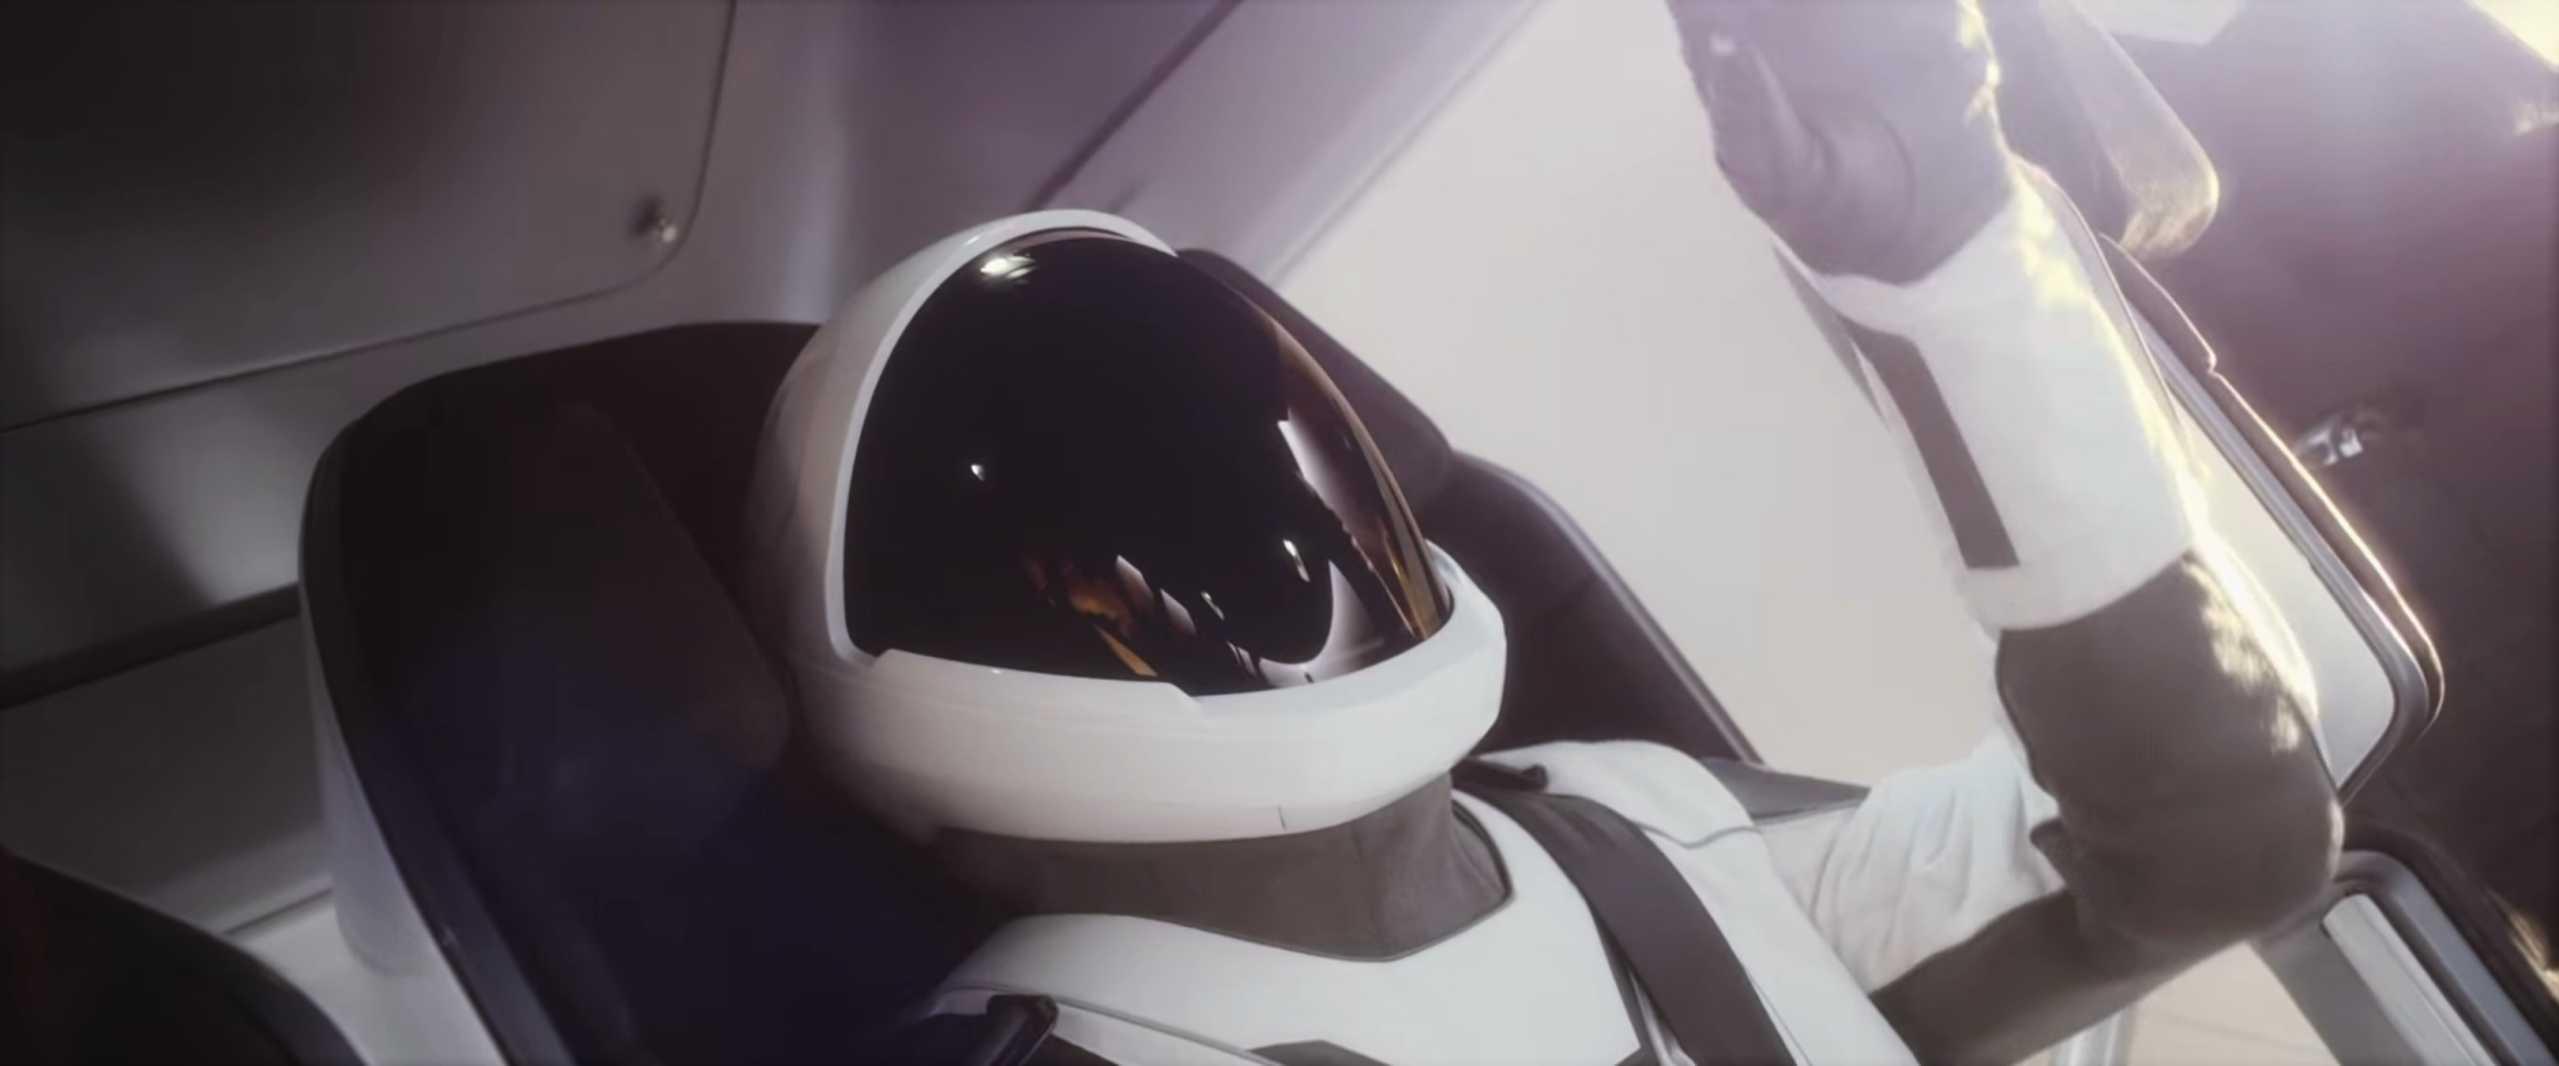 Crew Dragon Demo-2 animation Dec 2019 (SpaceX) astronauts 3 (c)